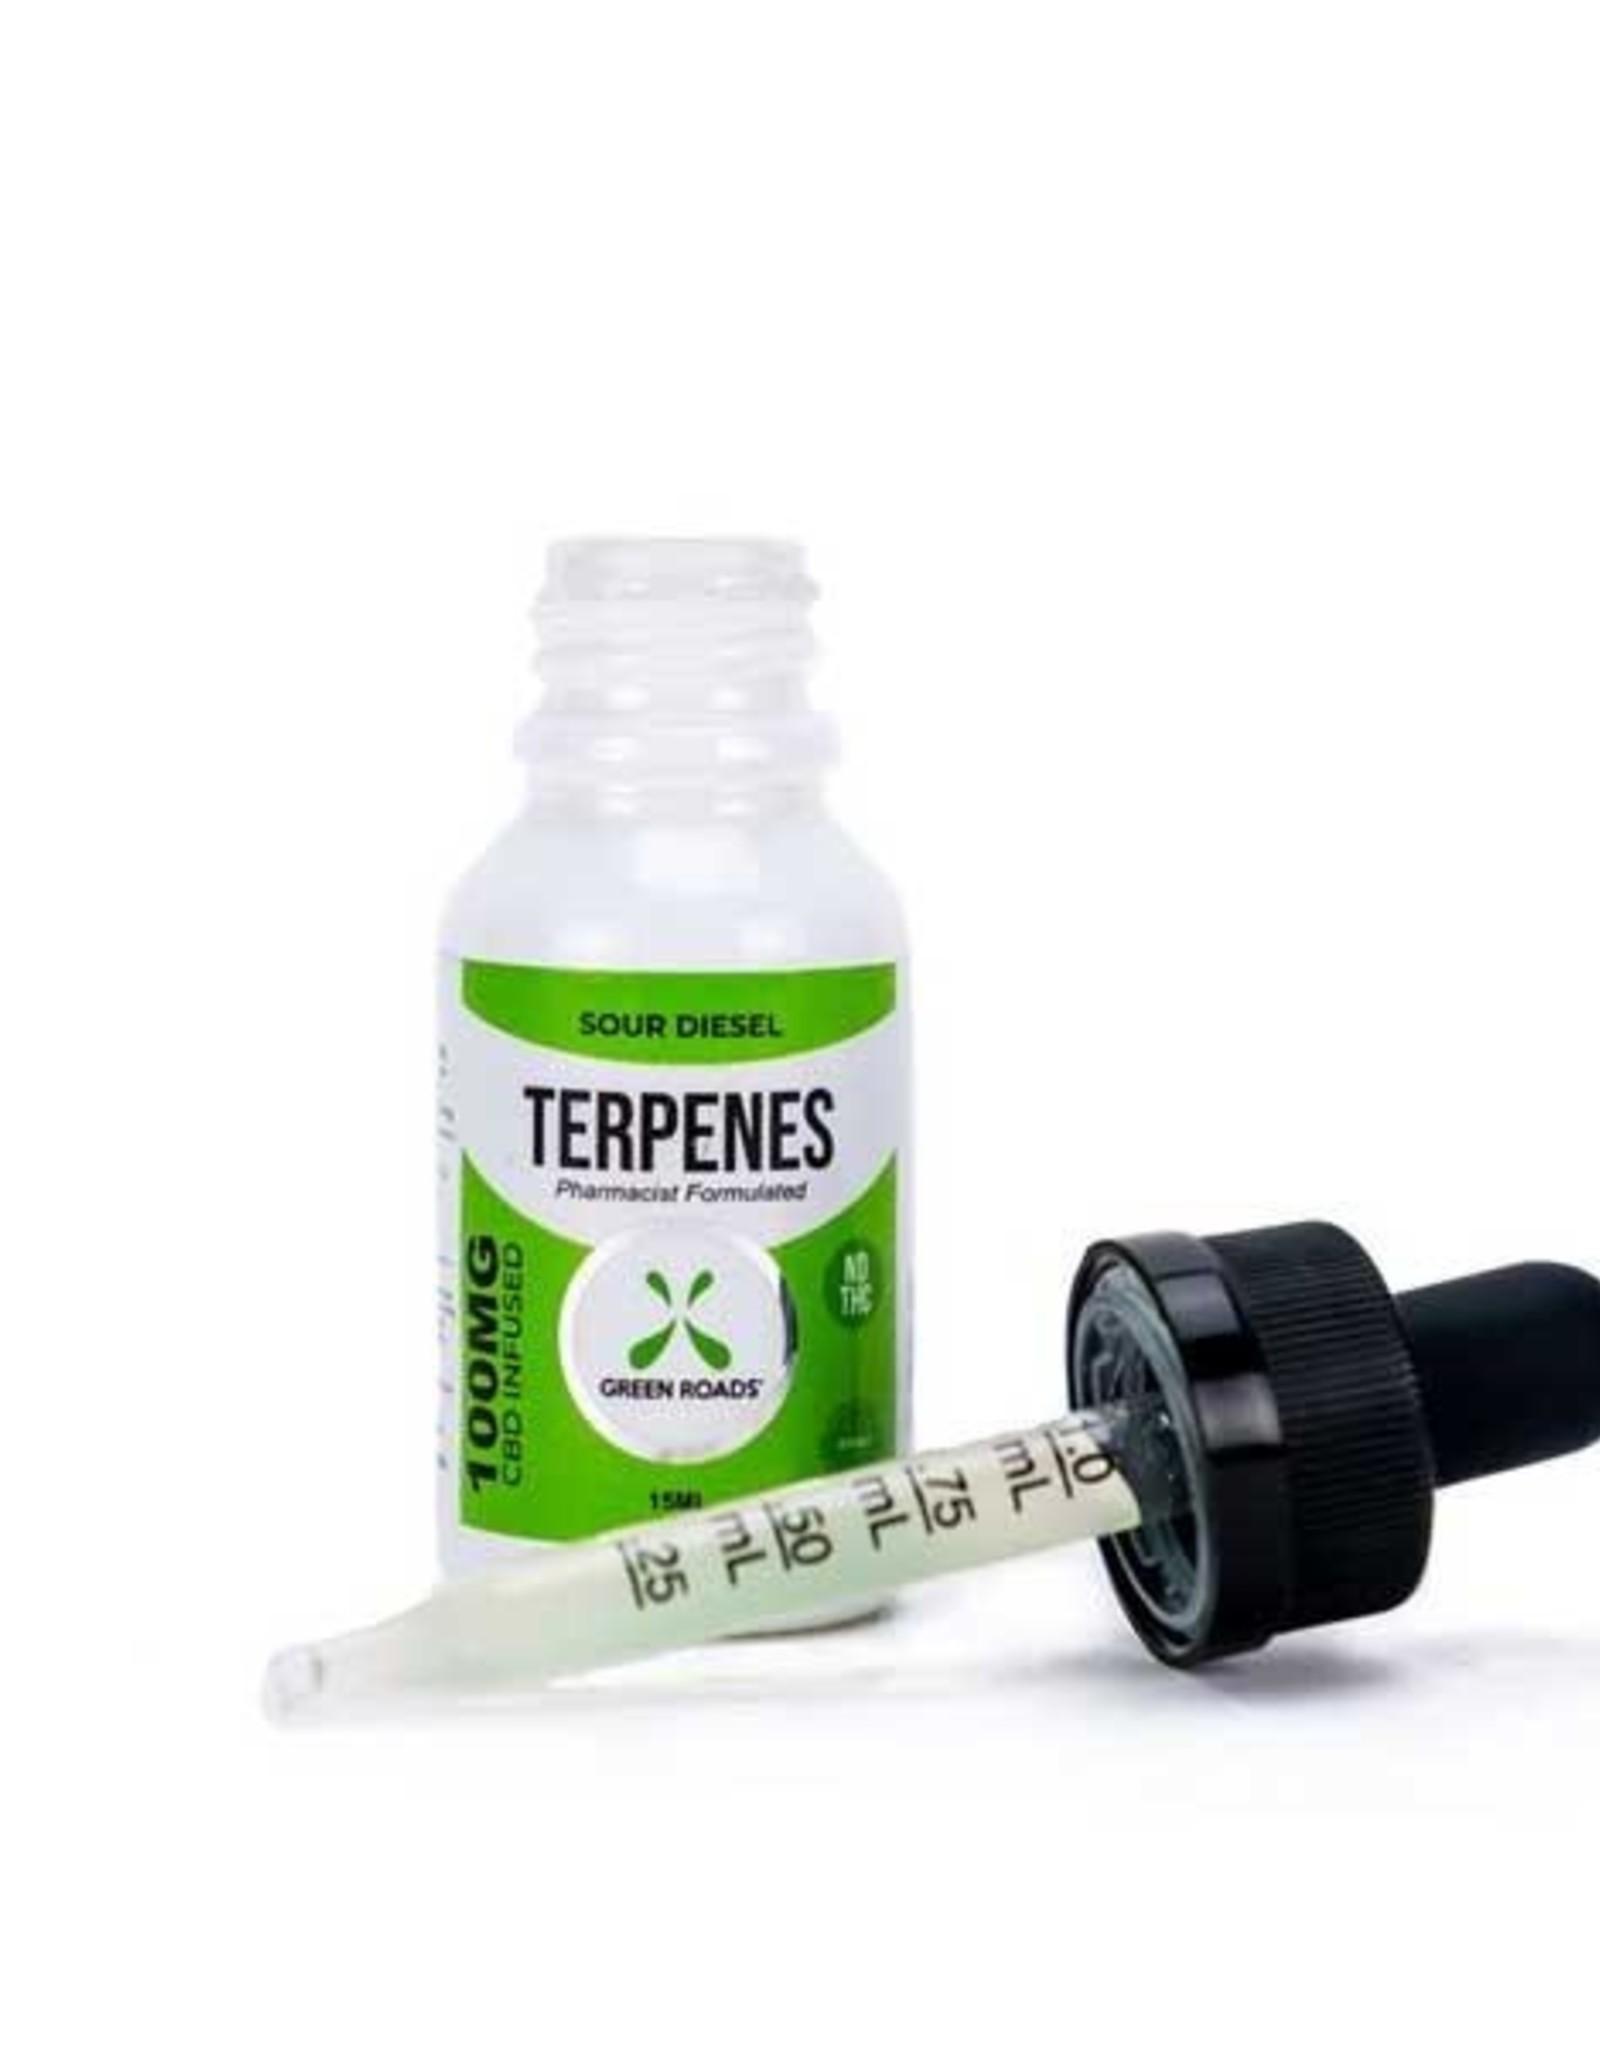 Green Roads 100 MG Sour Diesel Terpene Oil